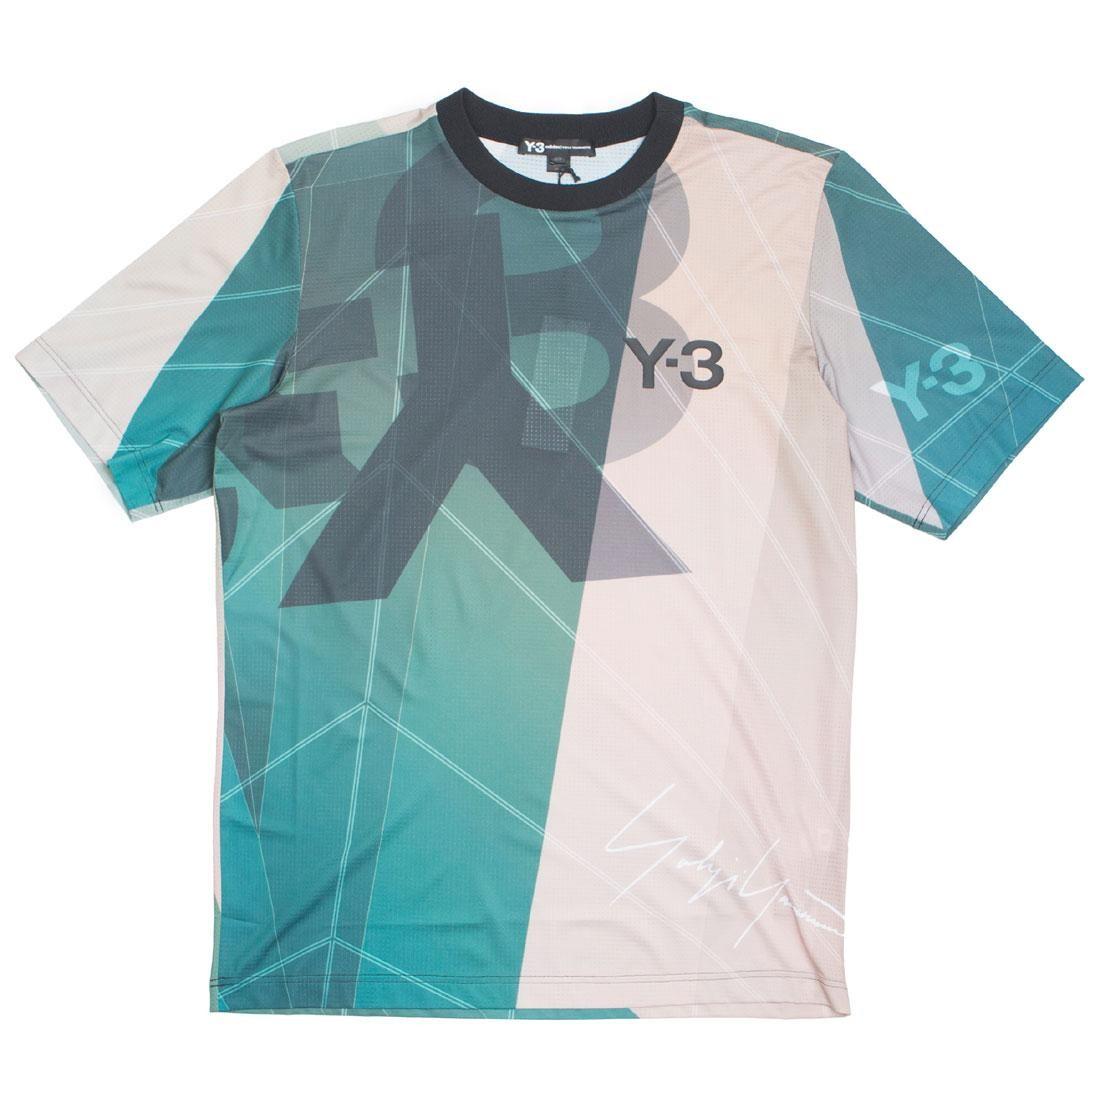 Adidas Y-3 Men AOP Football Shirt (green / sail salty champagne aop)